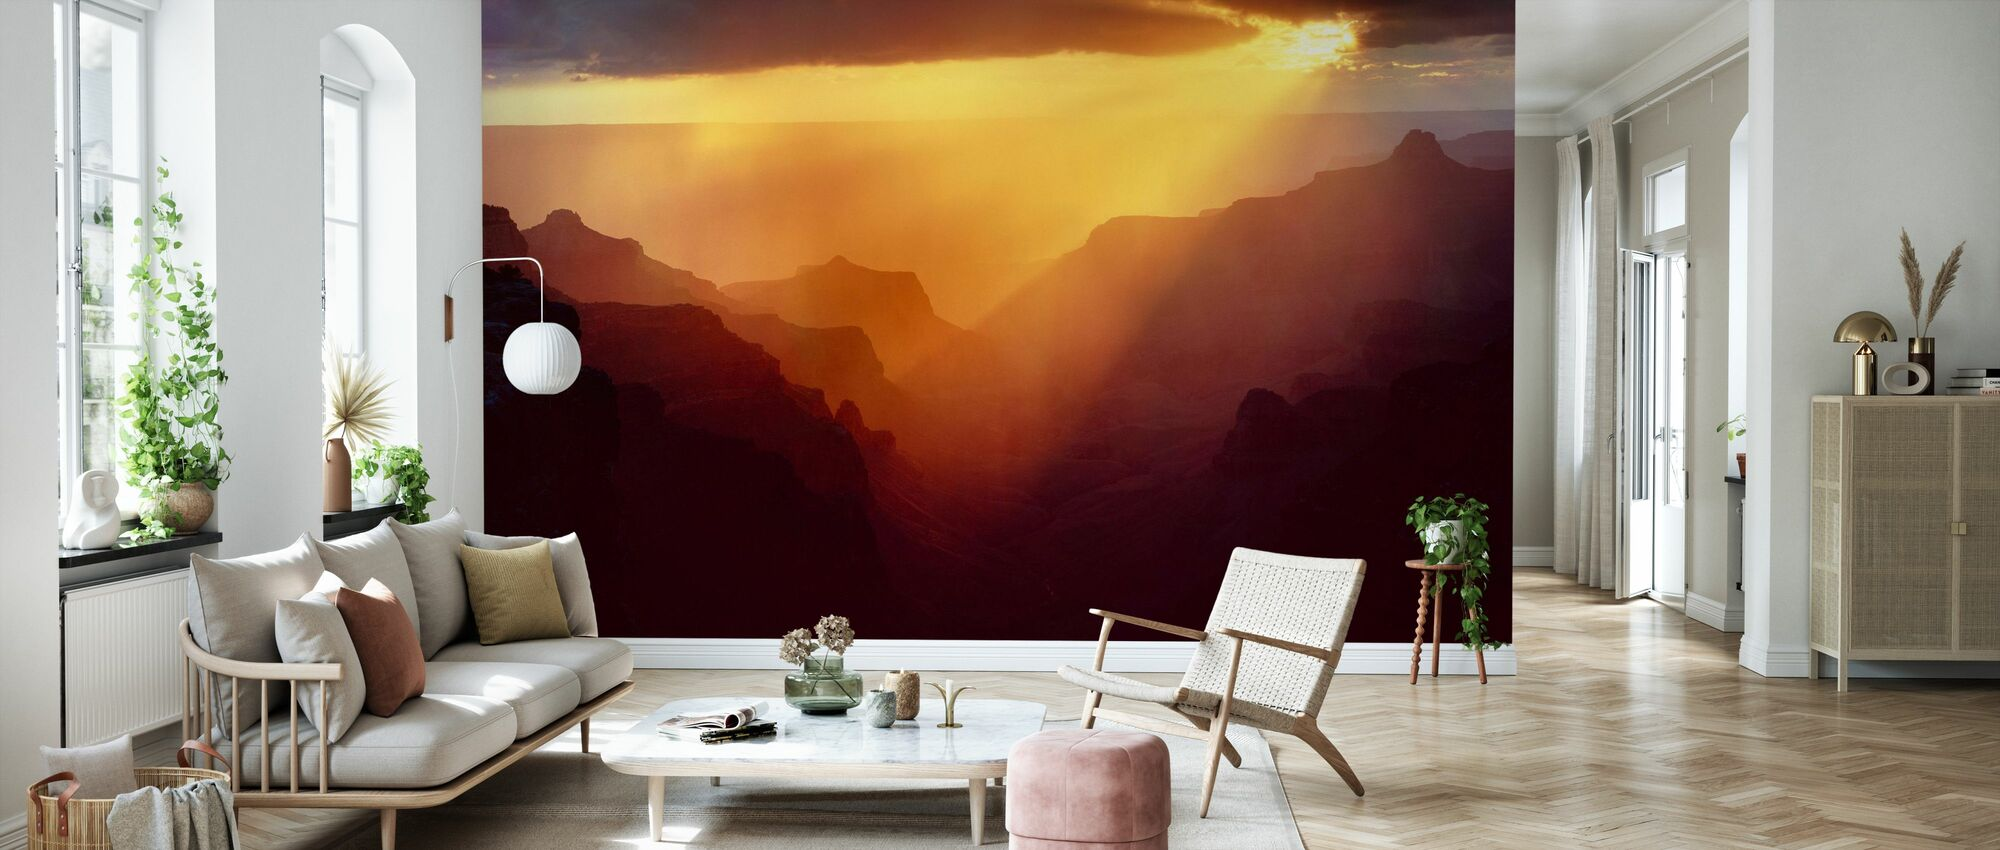 Canyon Ridges Sunset - Wallpaper - Living Room